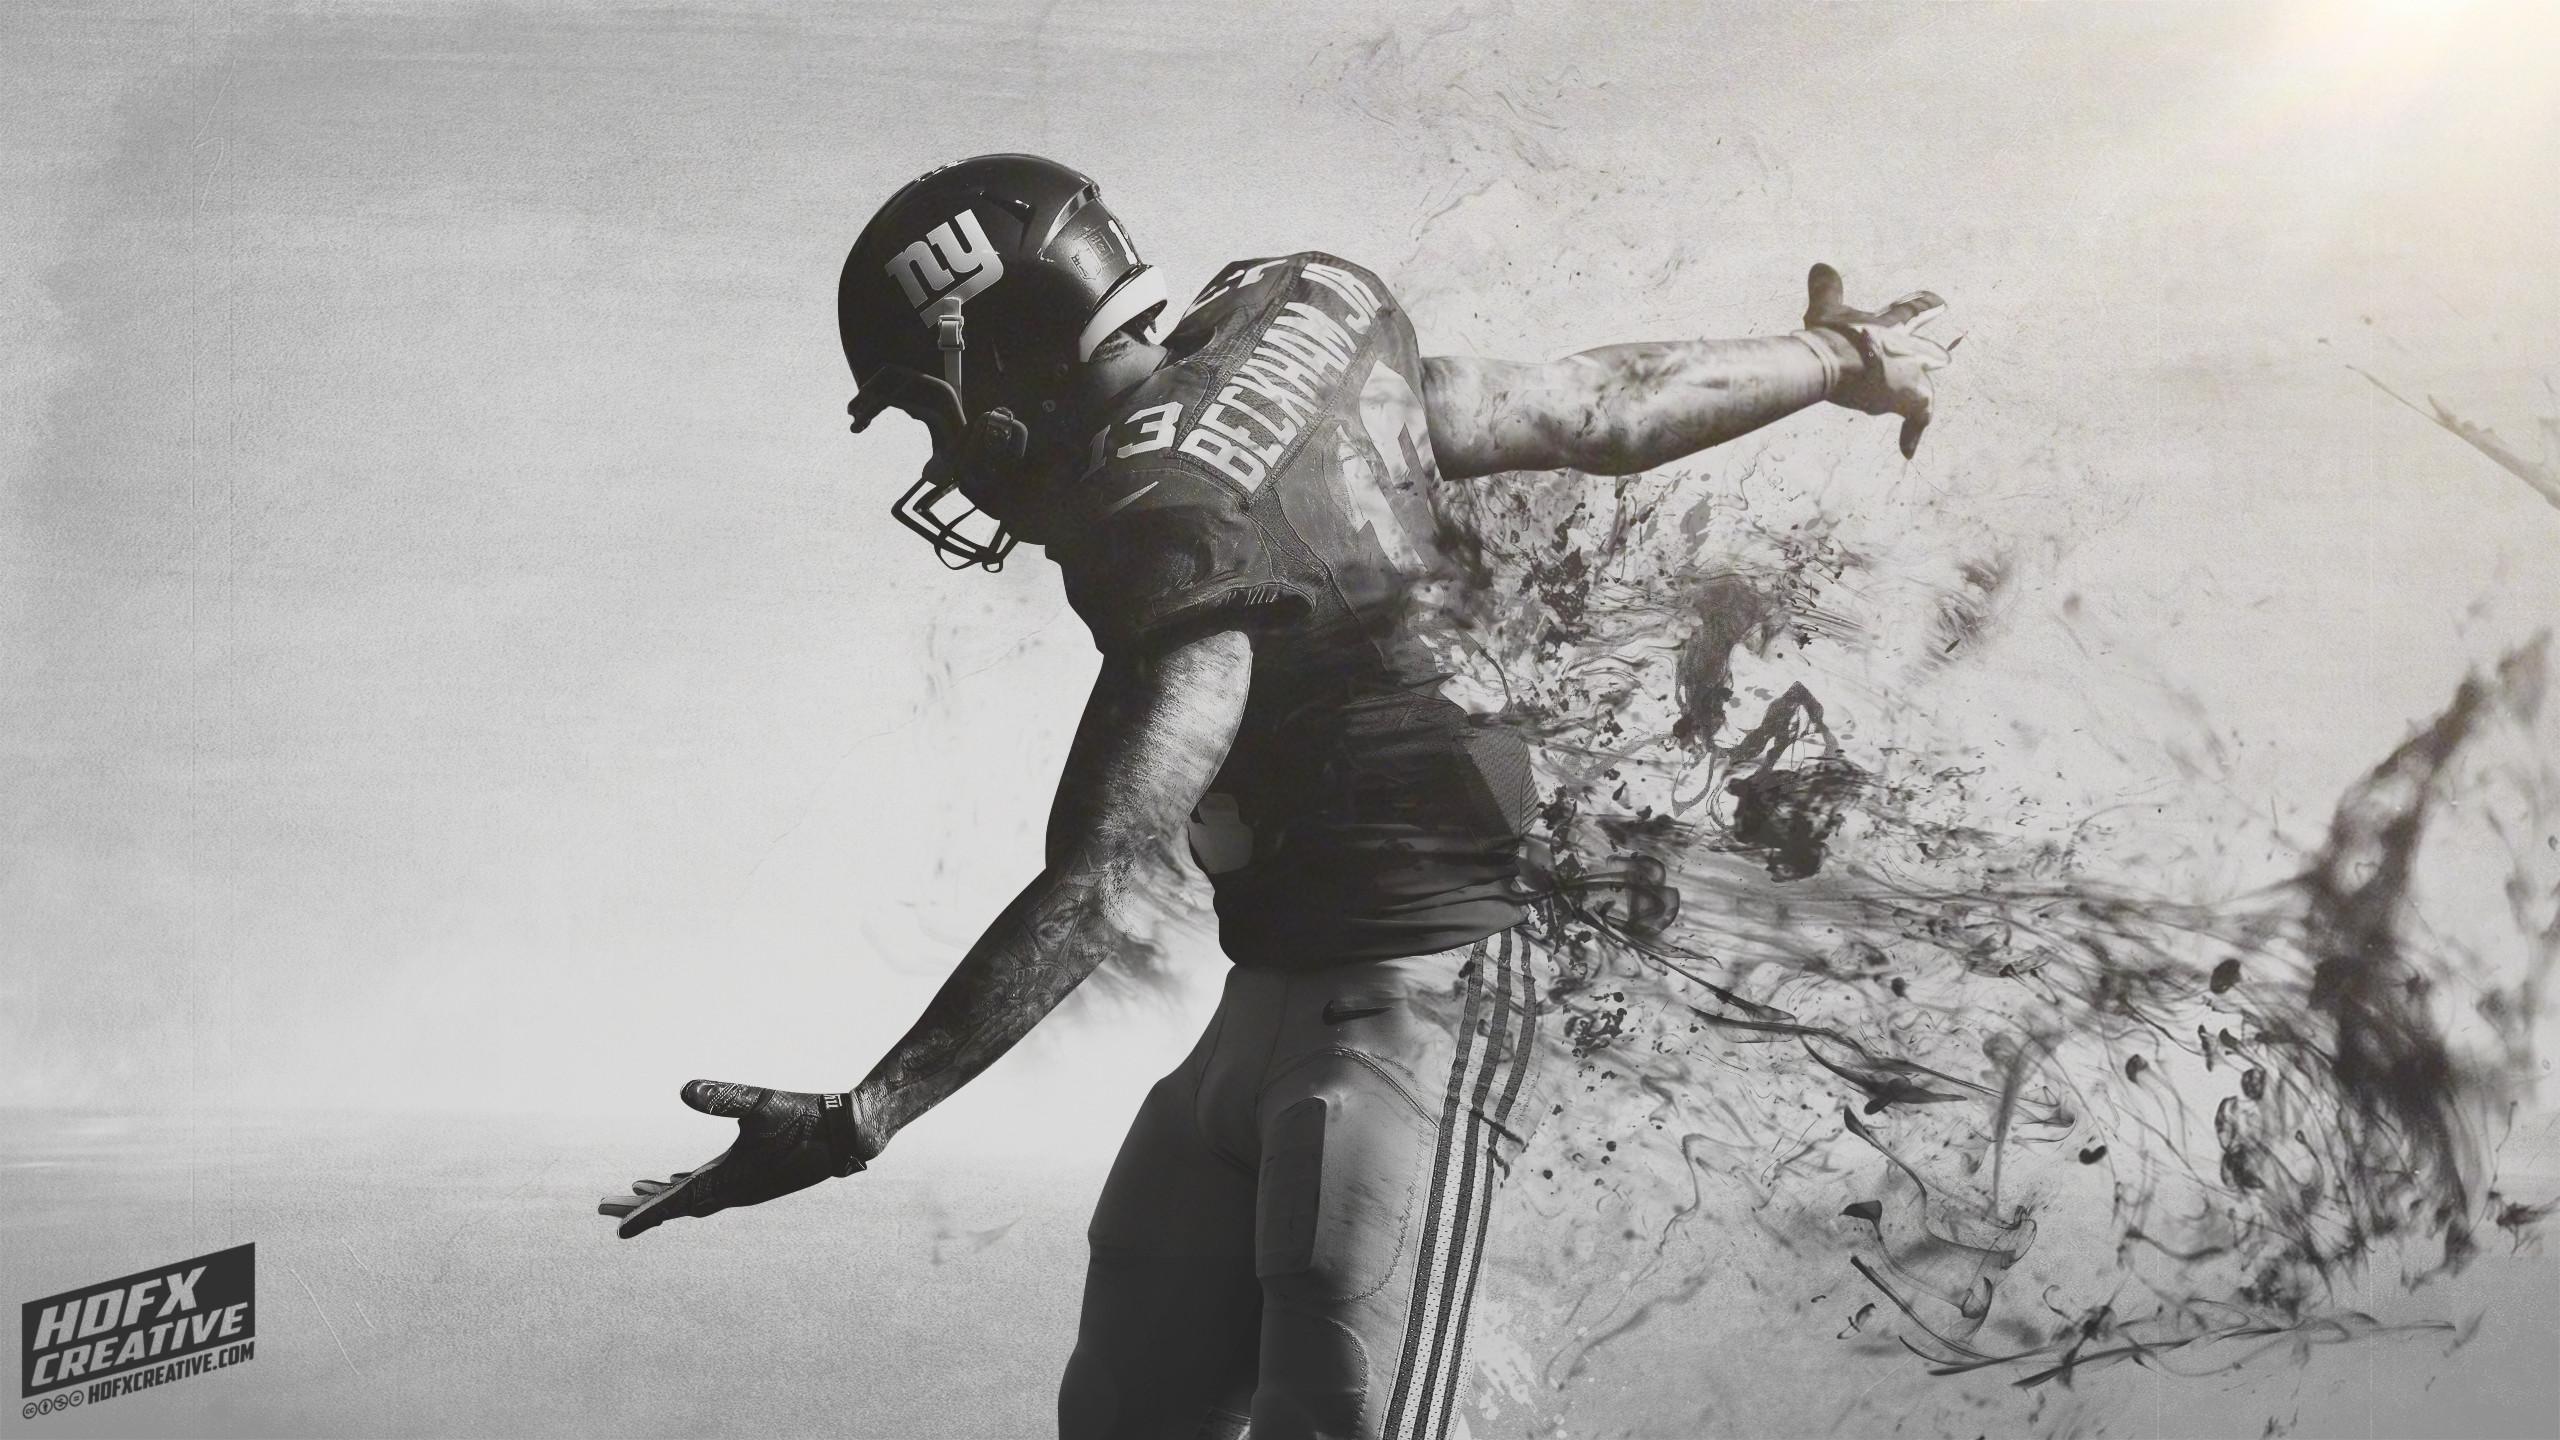 2560x1440 NFL Wallpapers | HDFX CREATIVE